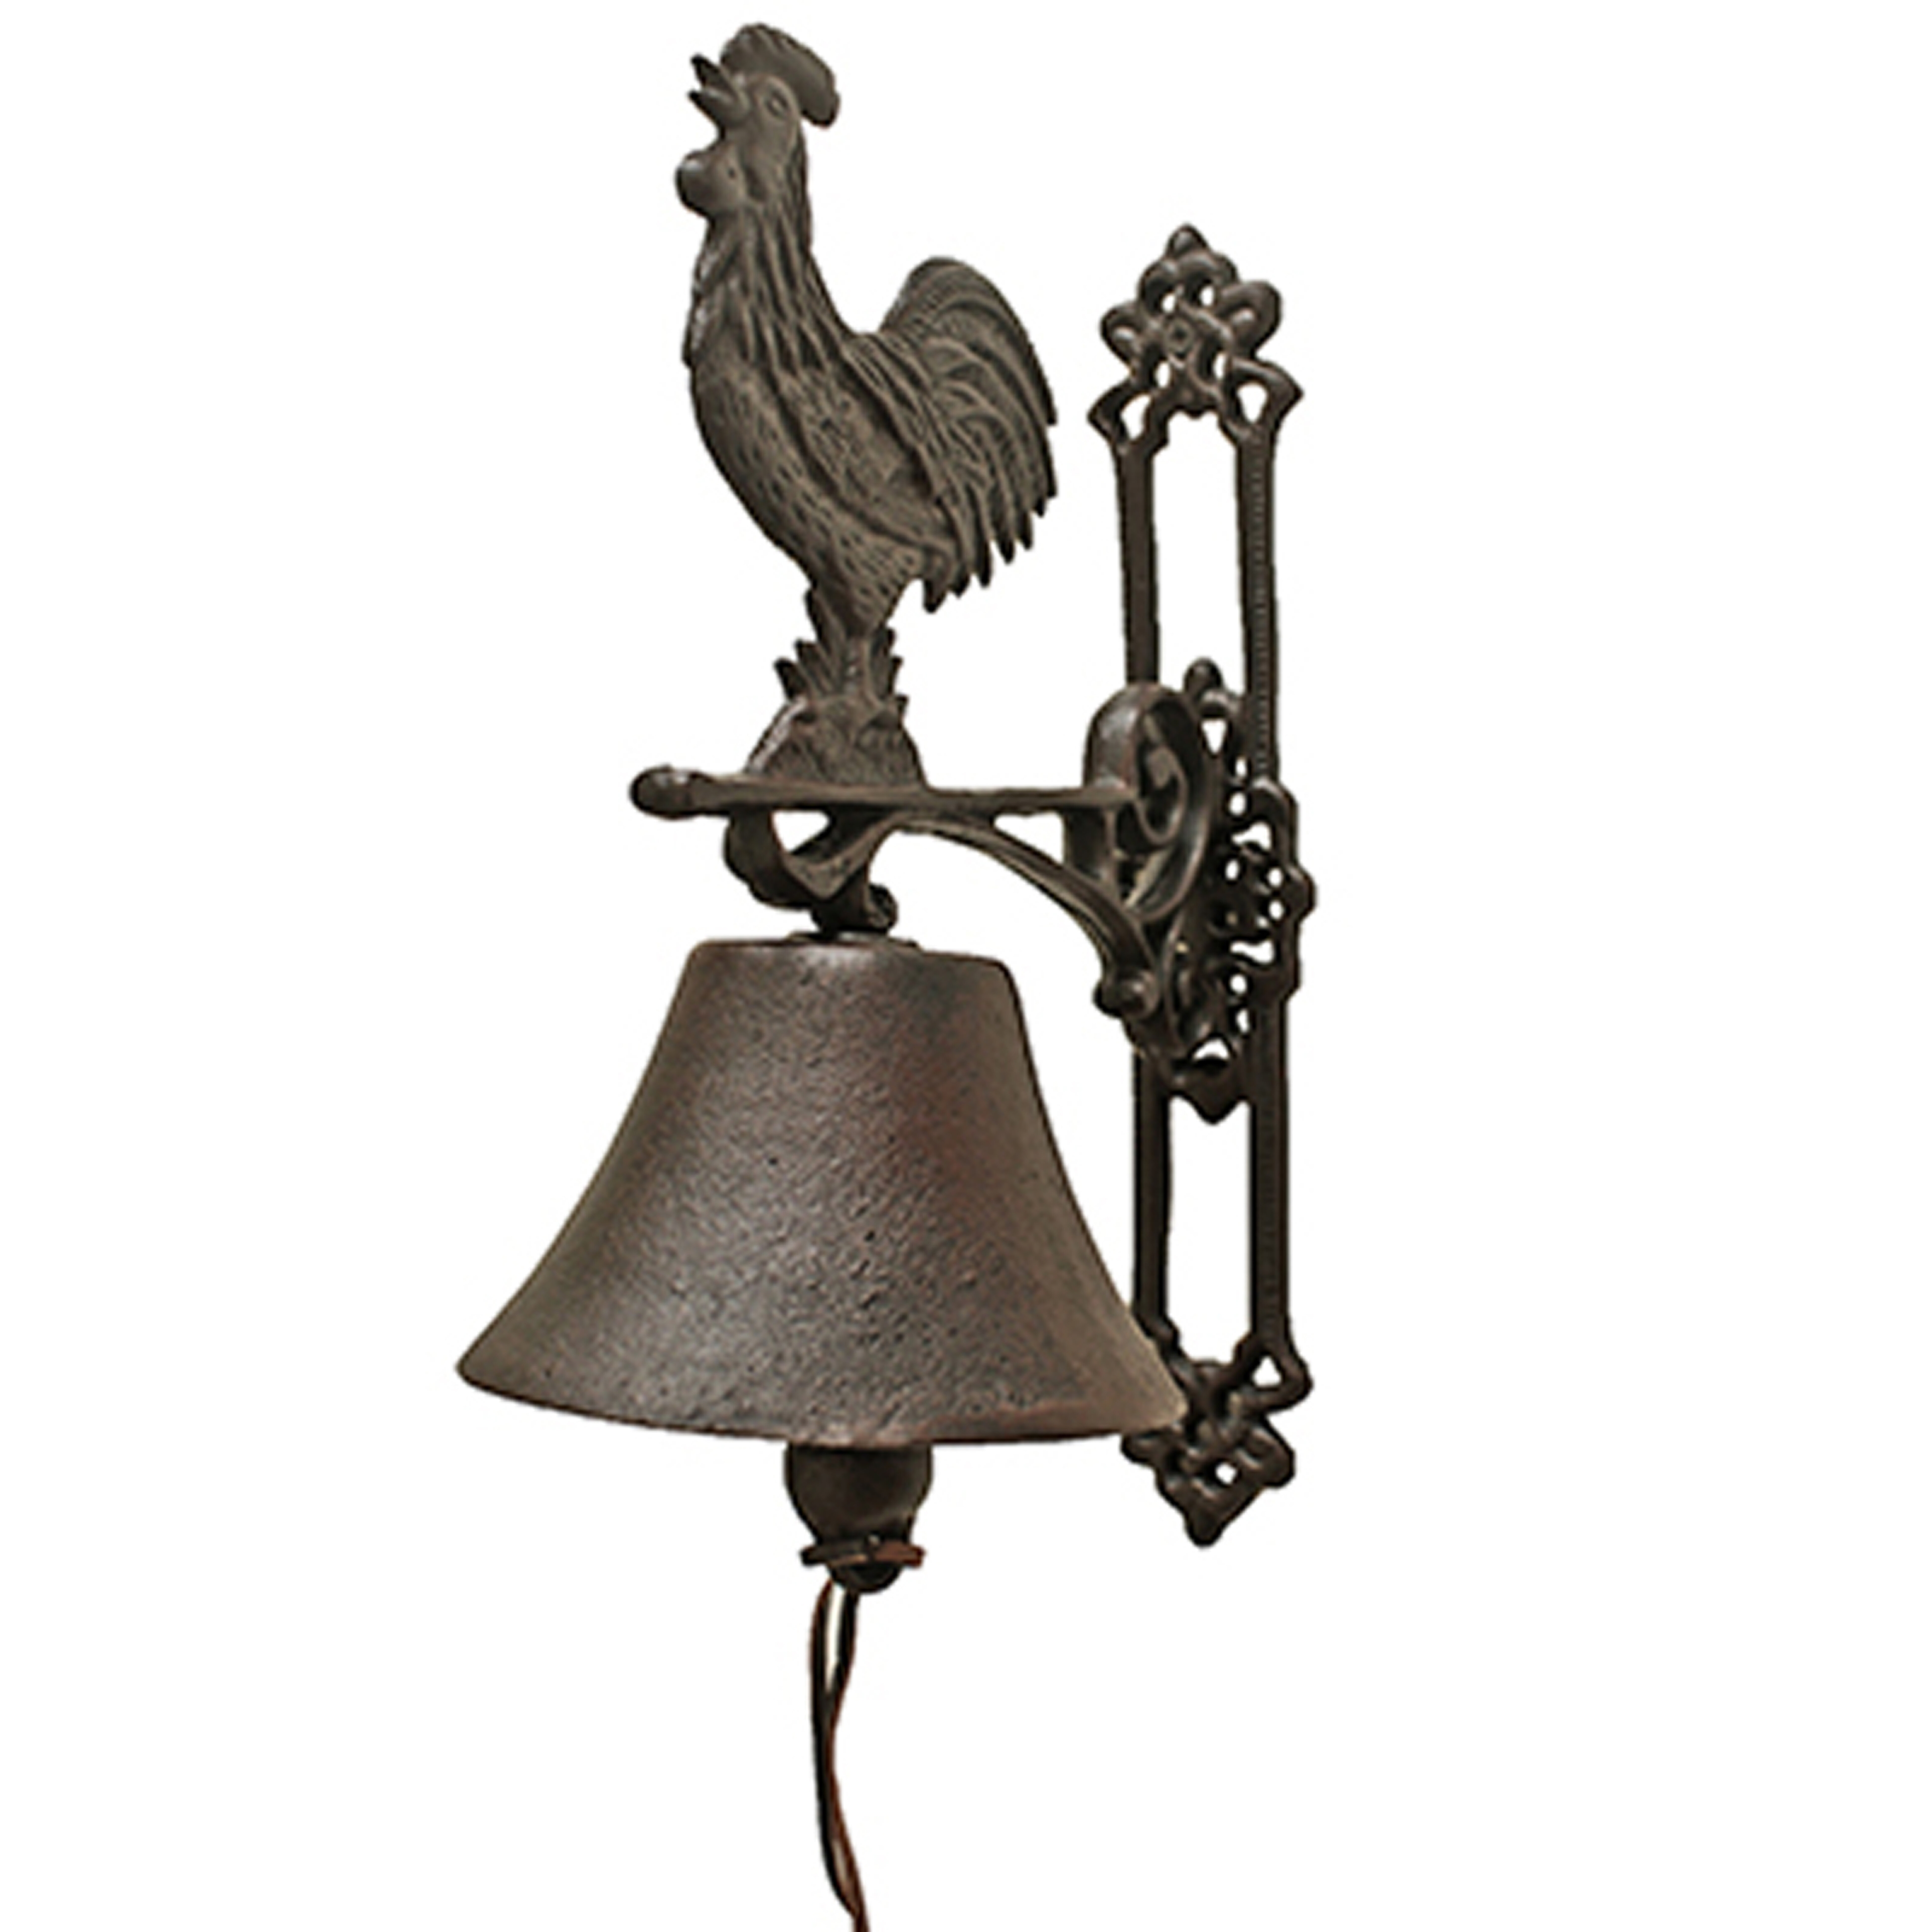 August Grove Doorbell Rooster Door Chime Wayfair How To Add A Second